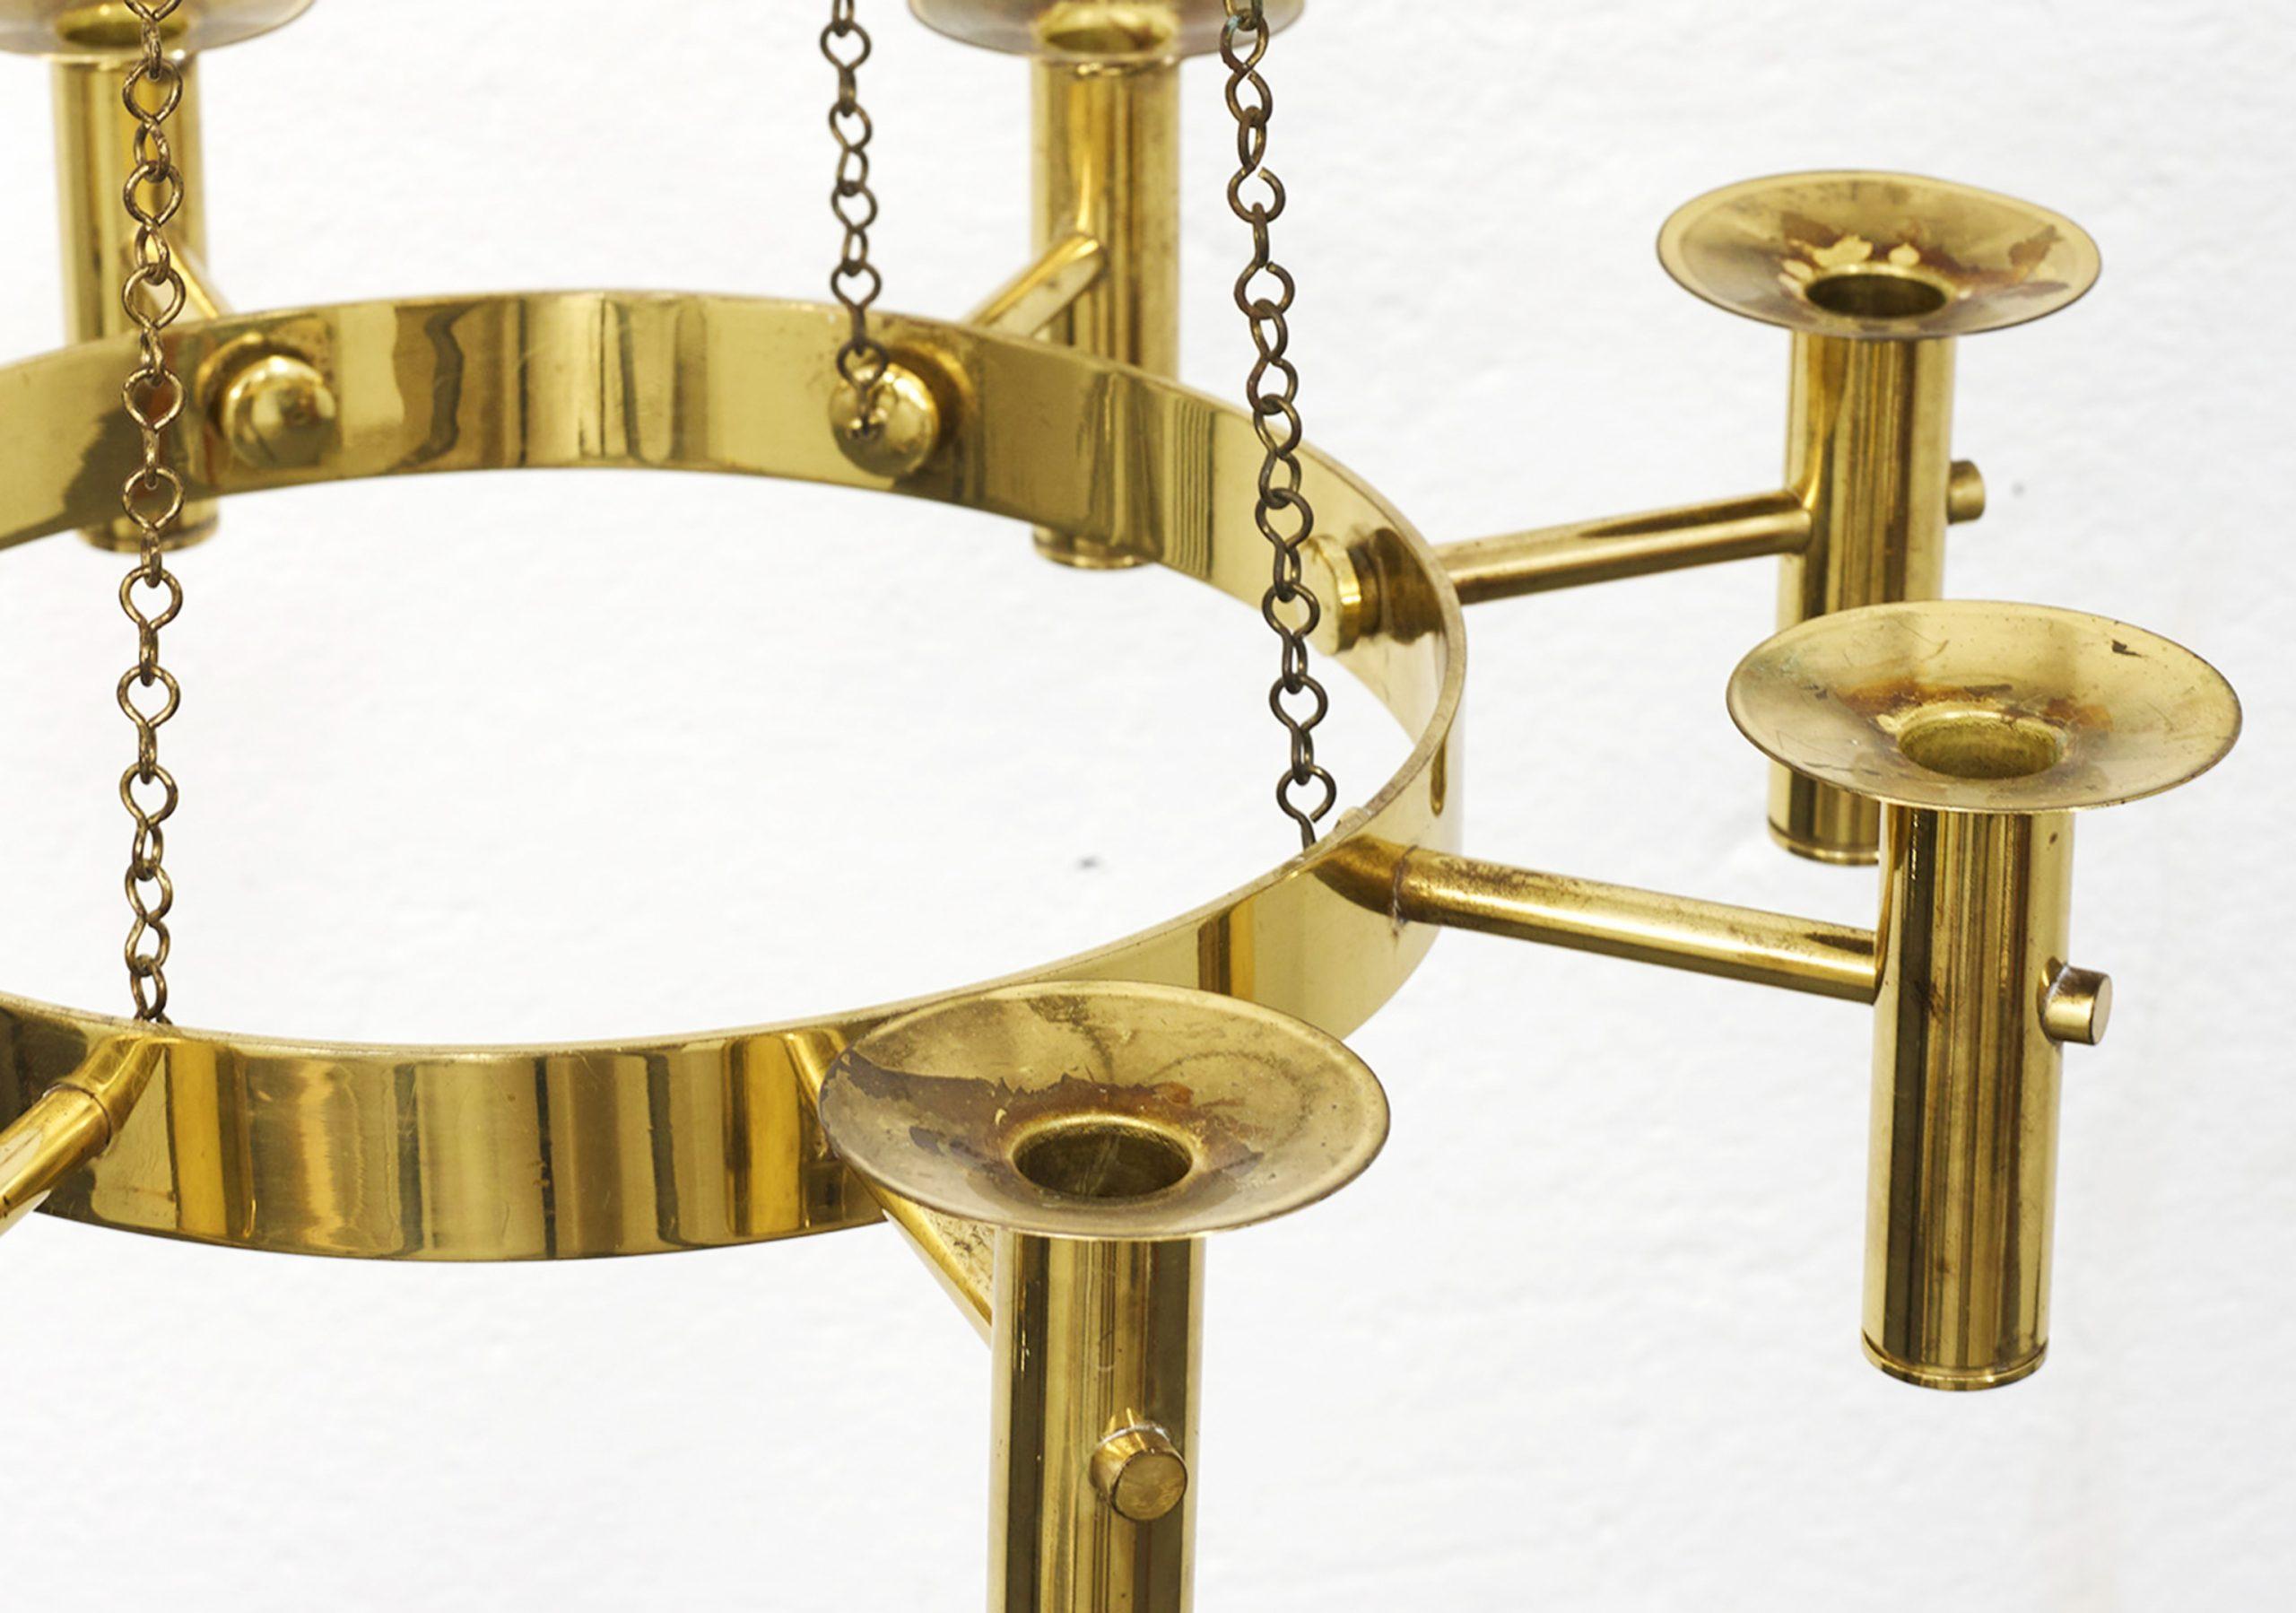 hans-agne-jakobsson-chandelier-c-1960-image-03